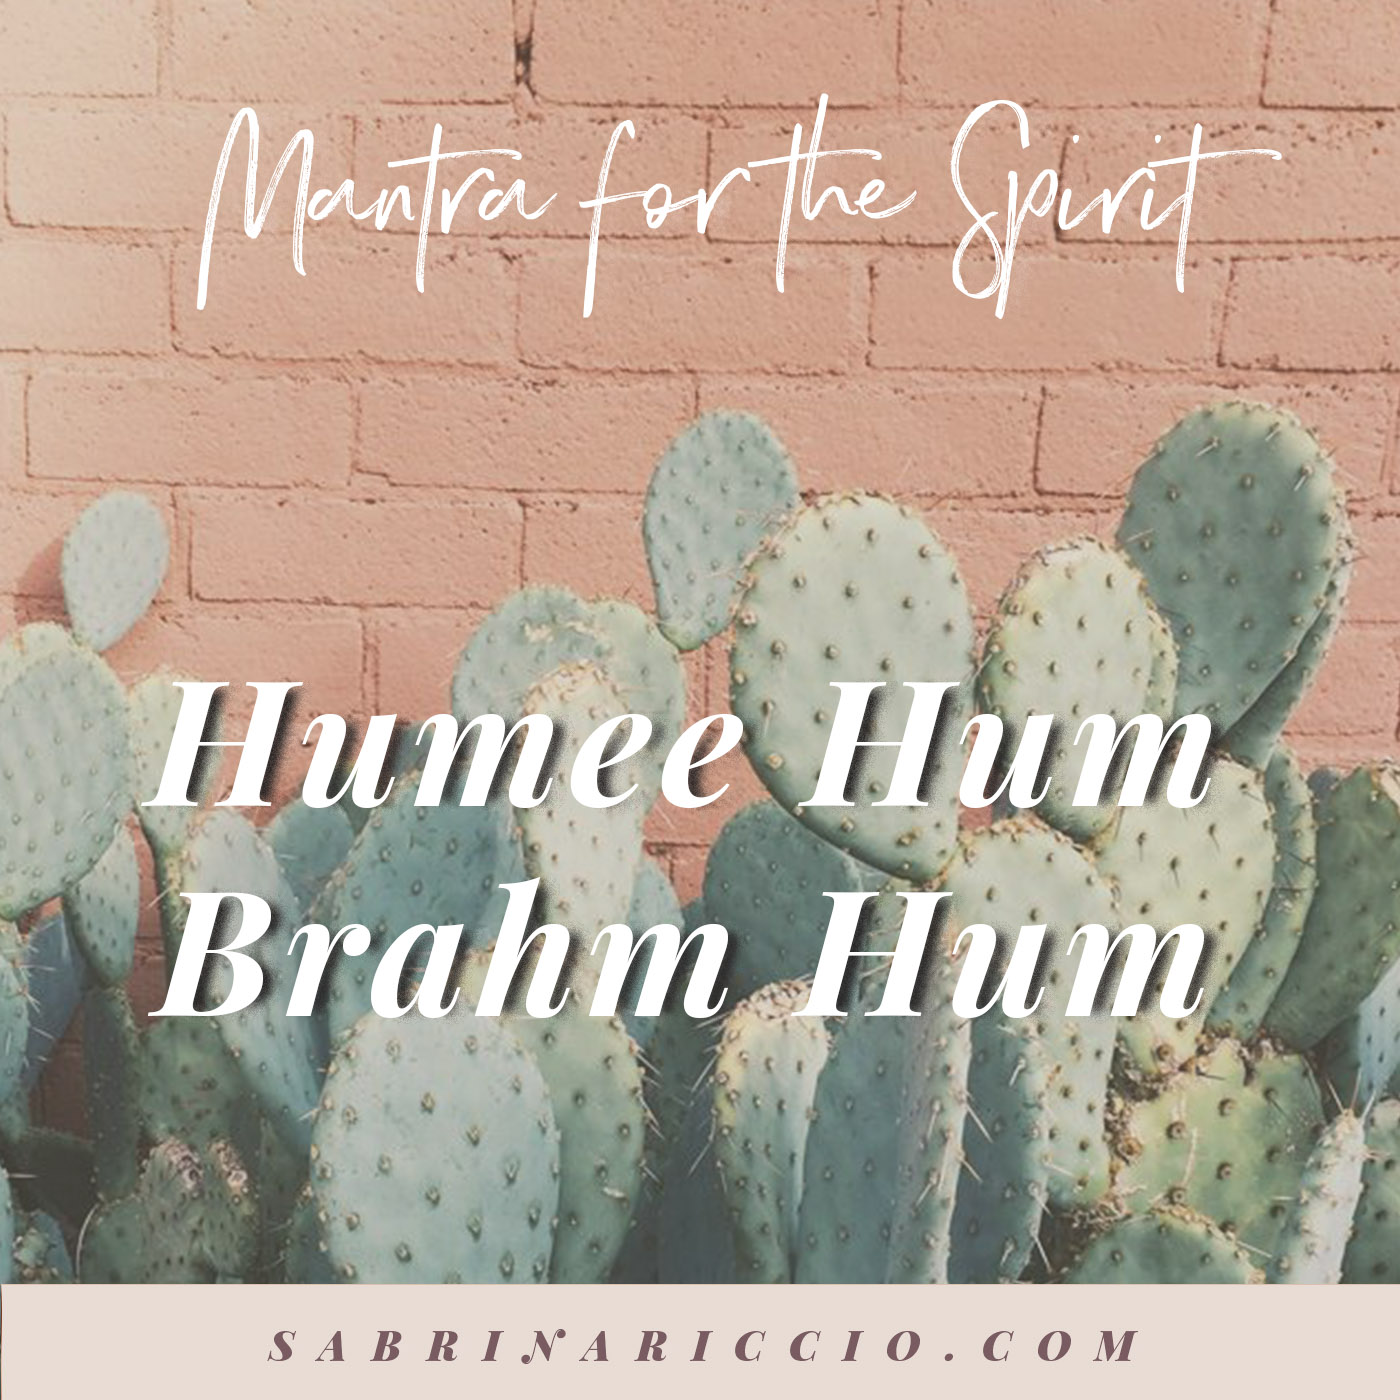 Kundalini Mantra for the Spirit   Humee Hum Brahm Hum    SabrinaRiccio.com